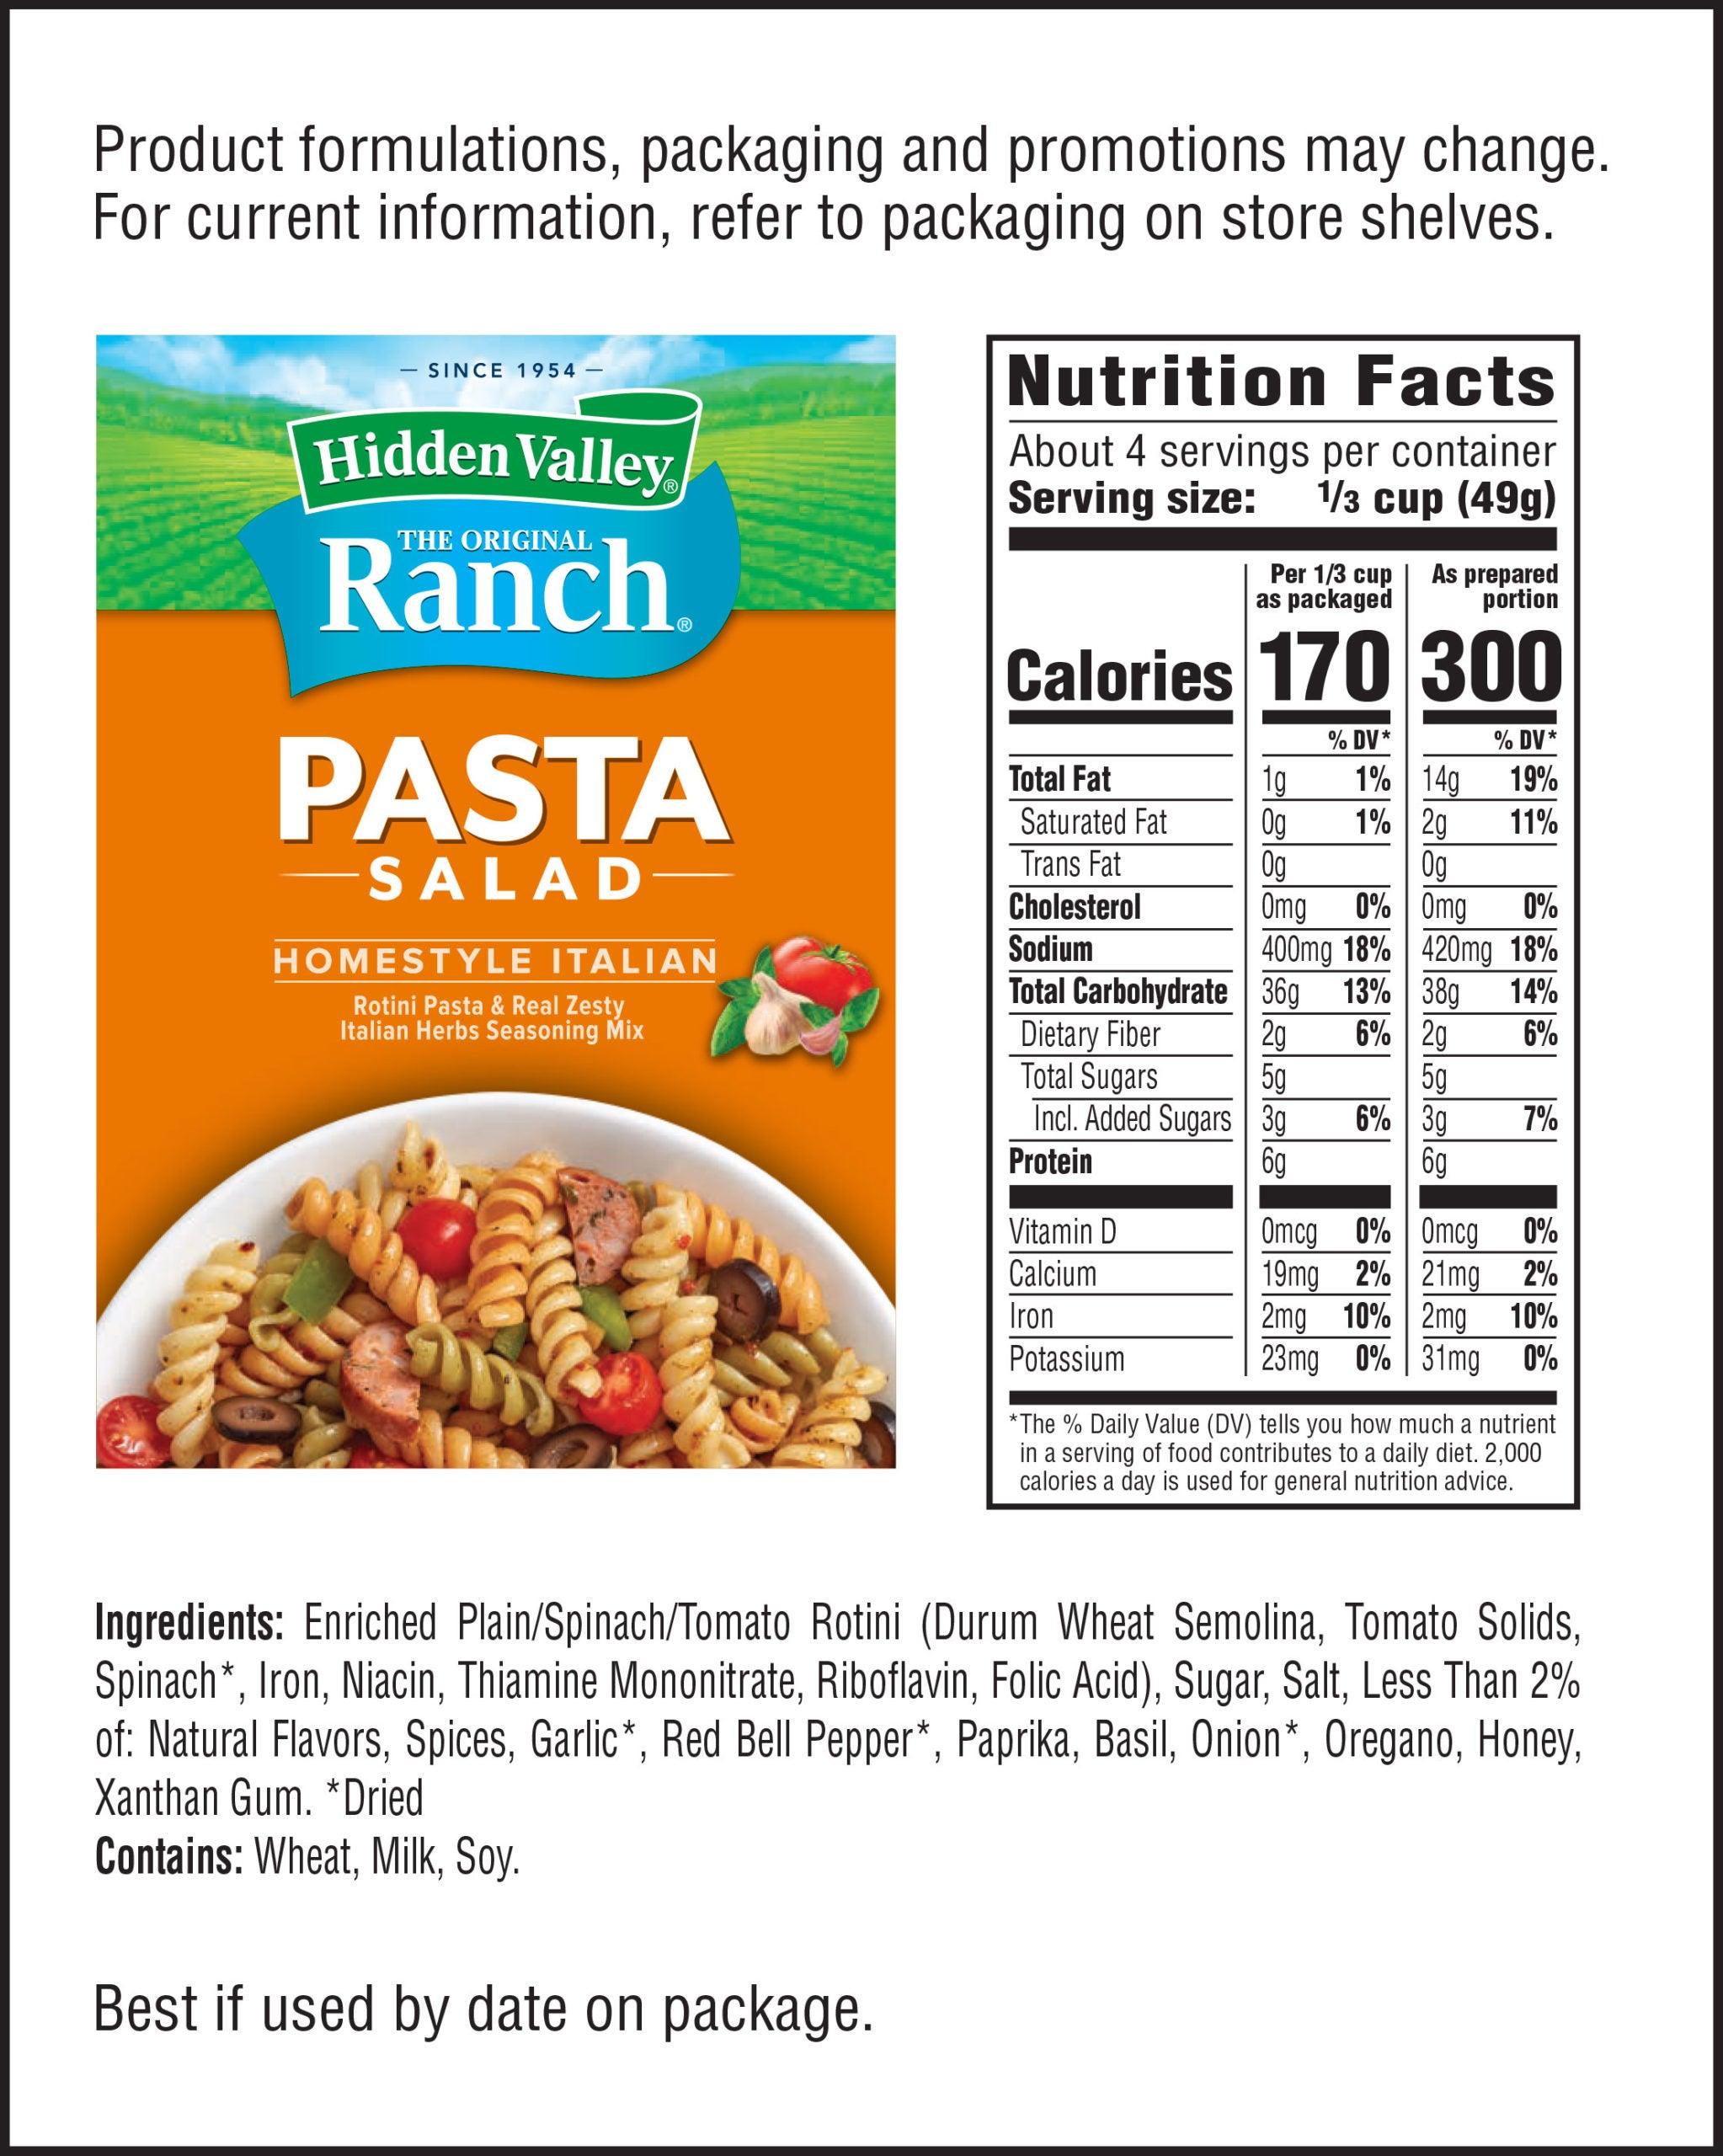 Hidden Valley® Homestyle Italian Pasta Salad nutritional facts